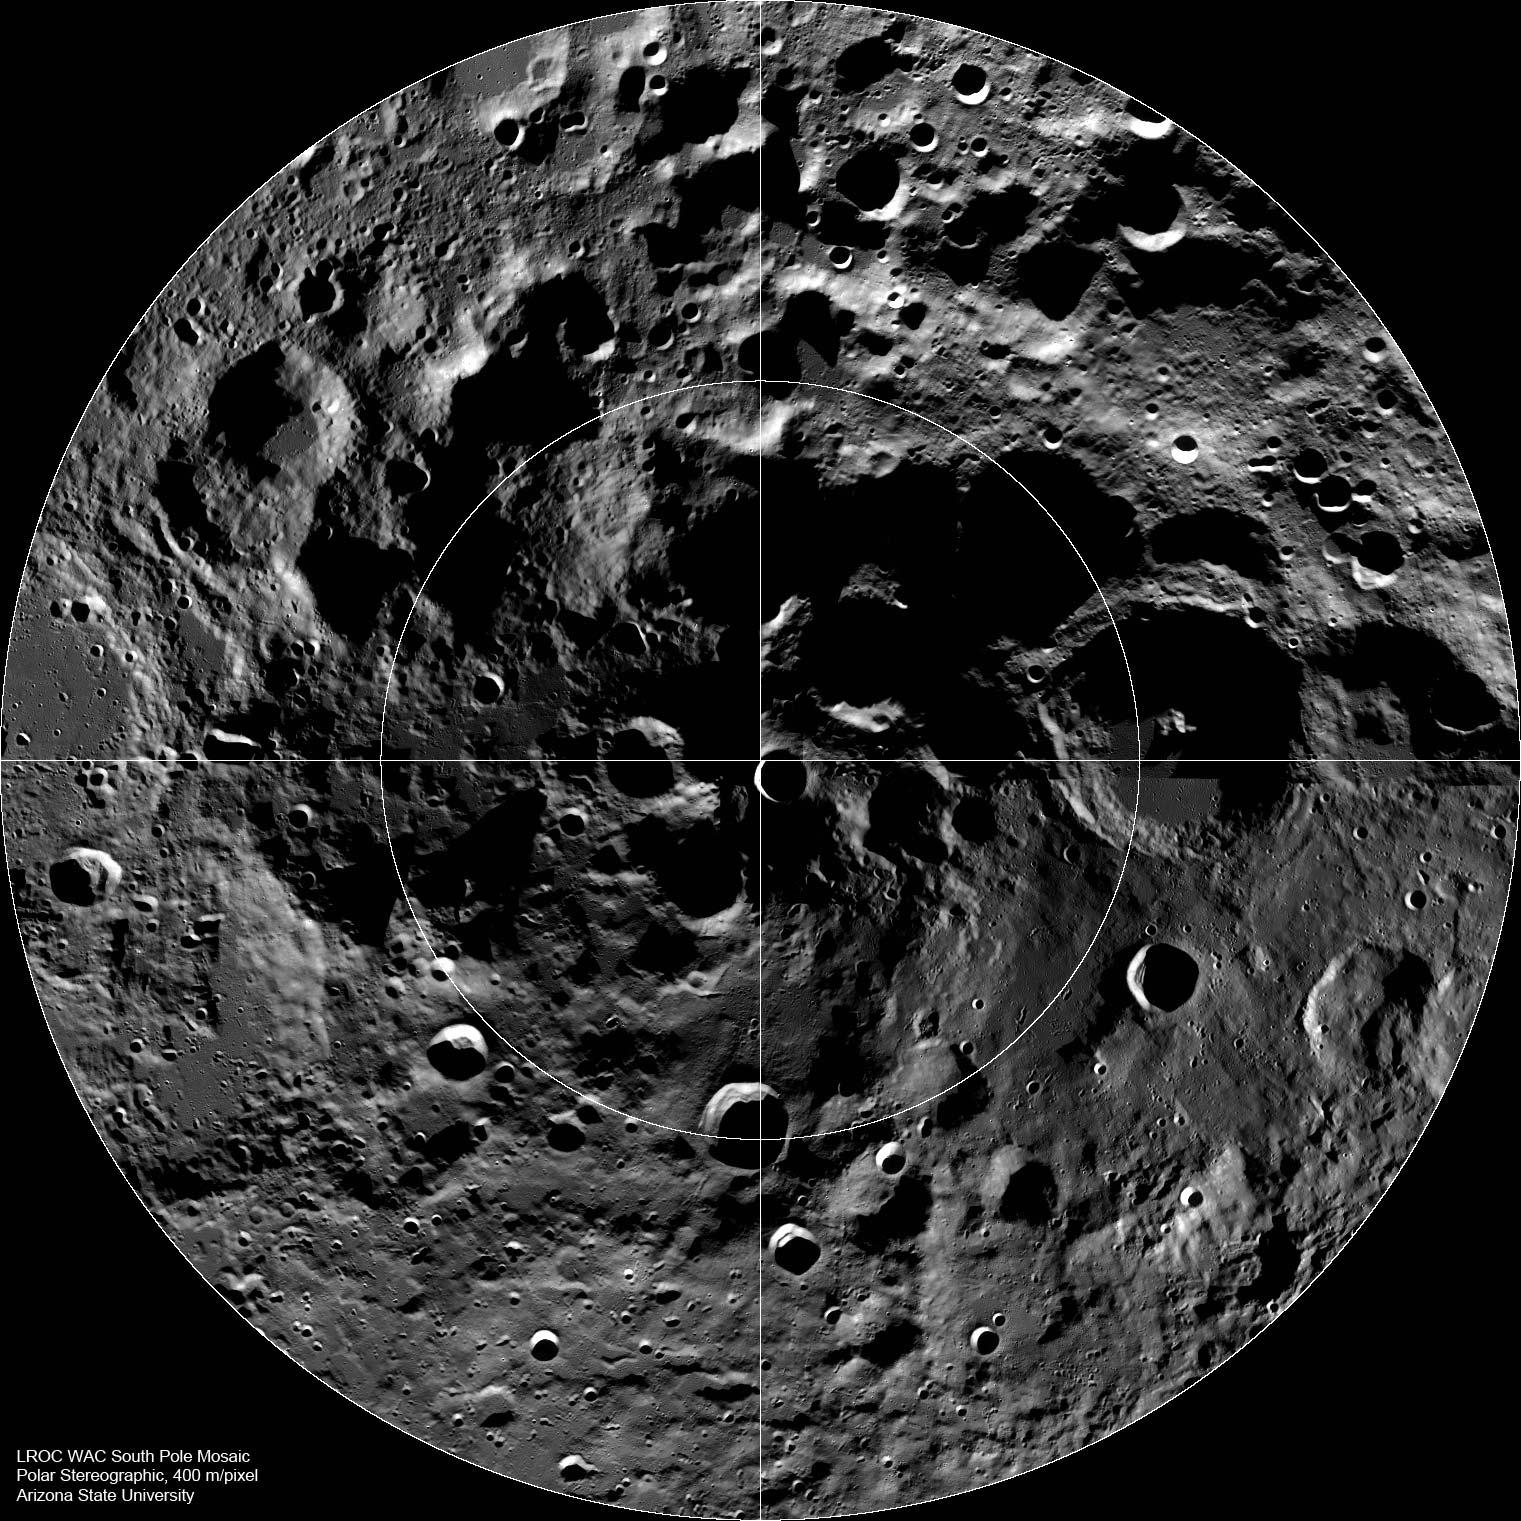 Moon's Permanently Shadowed Regions